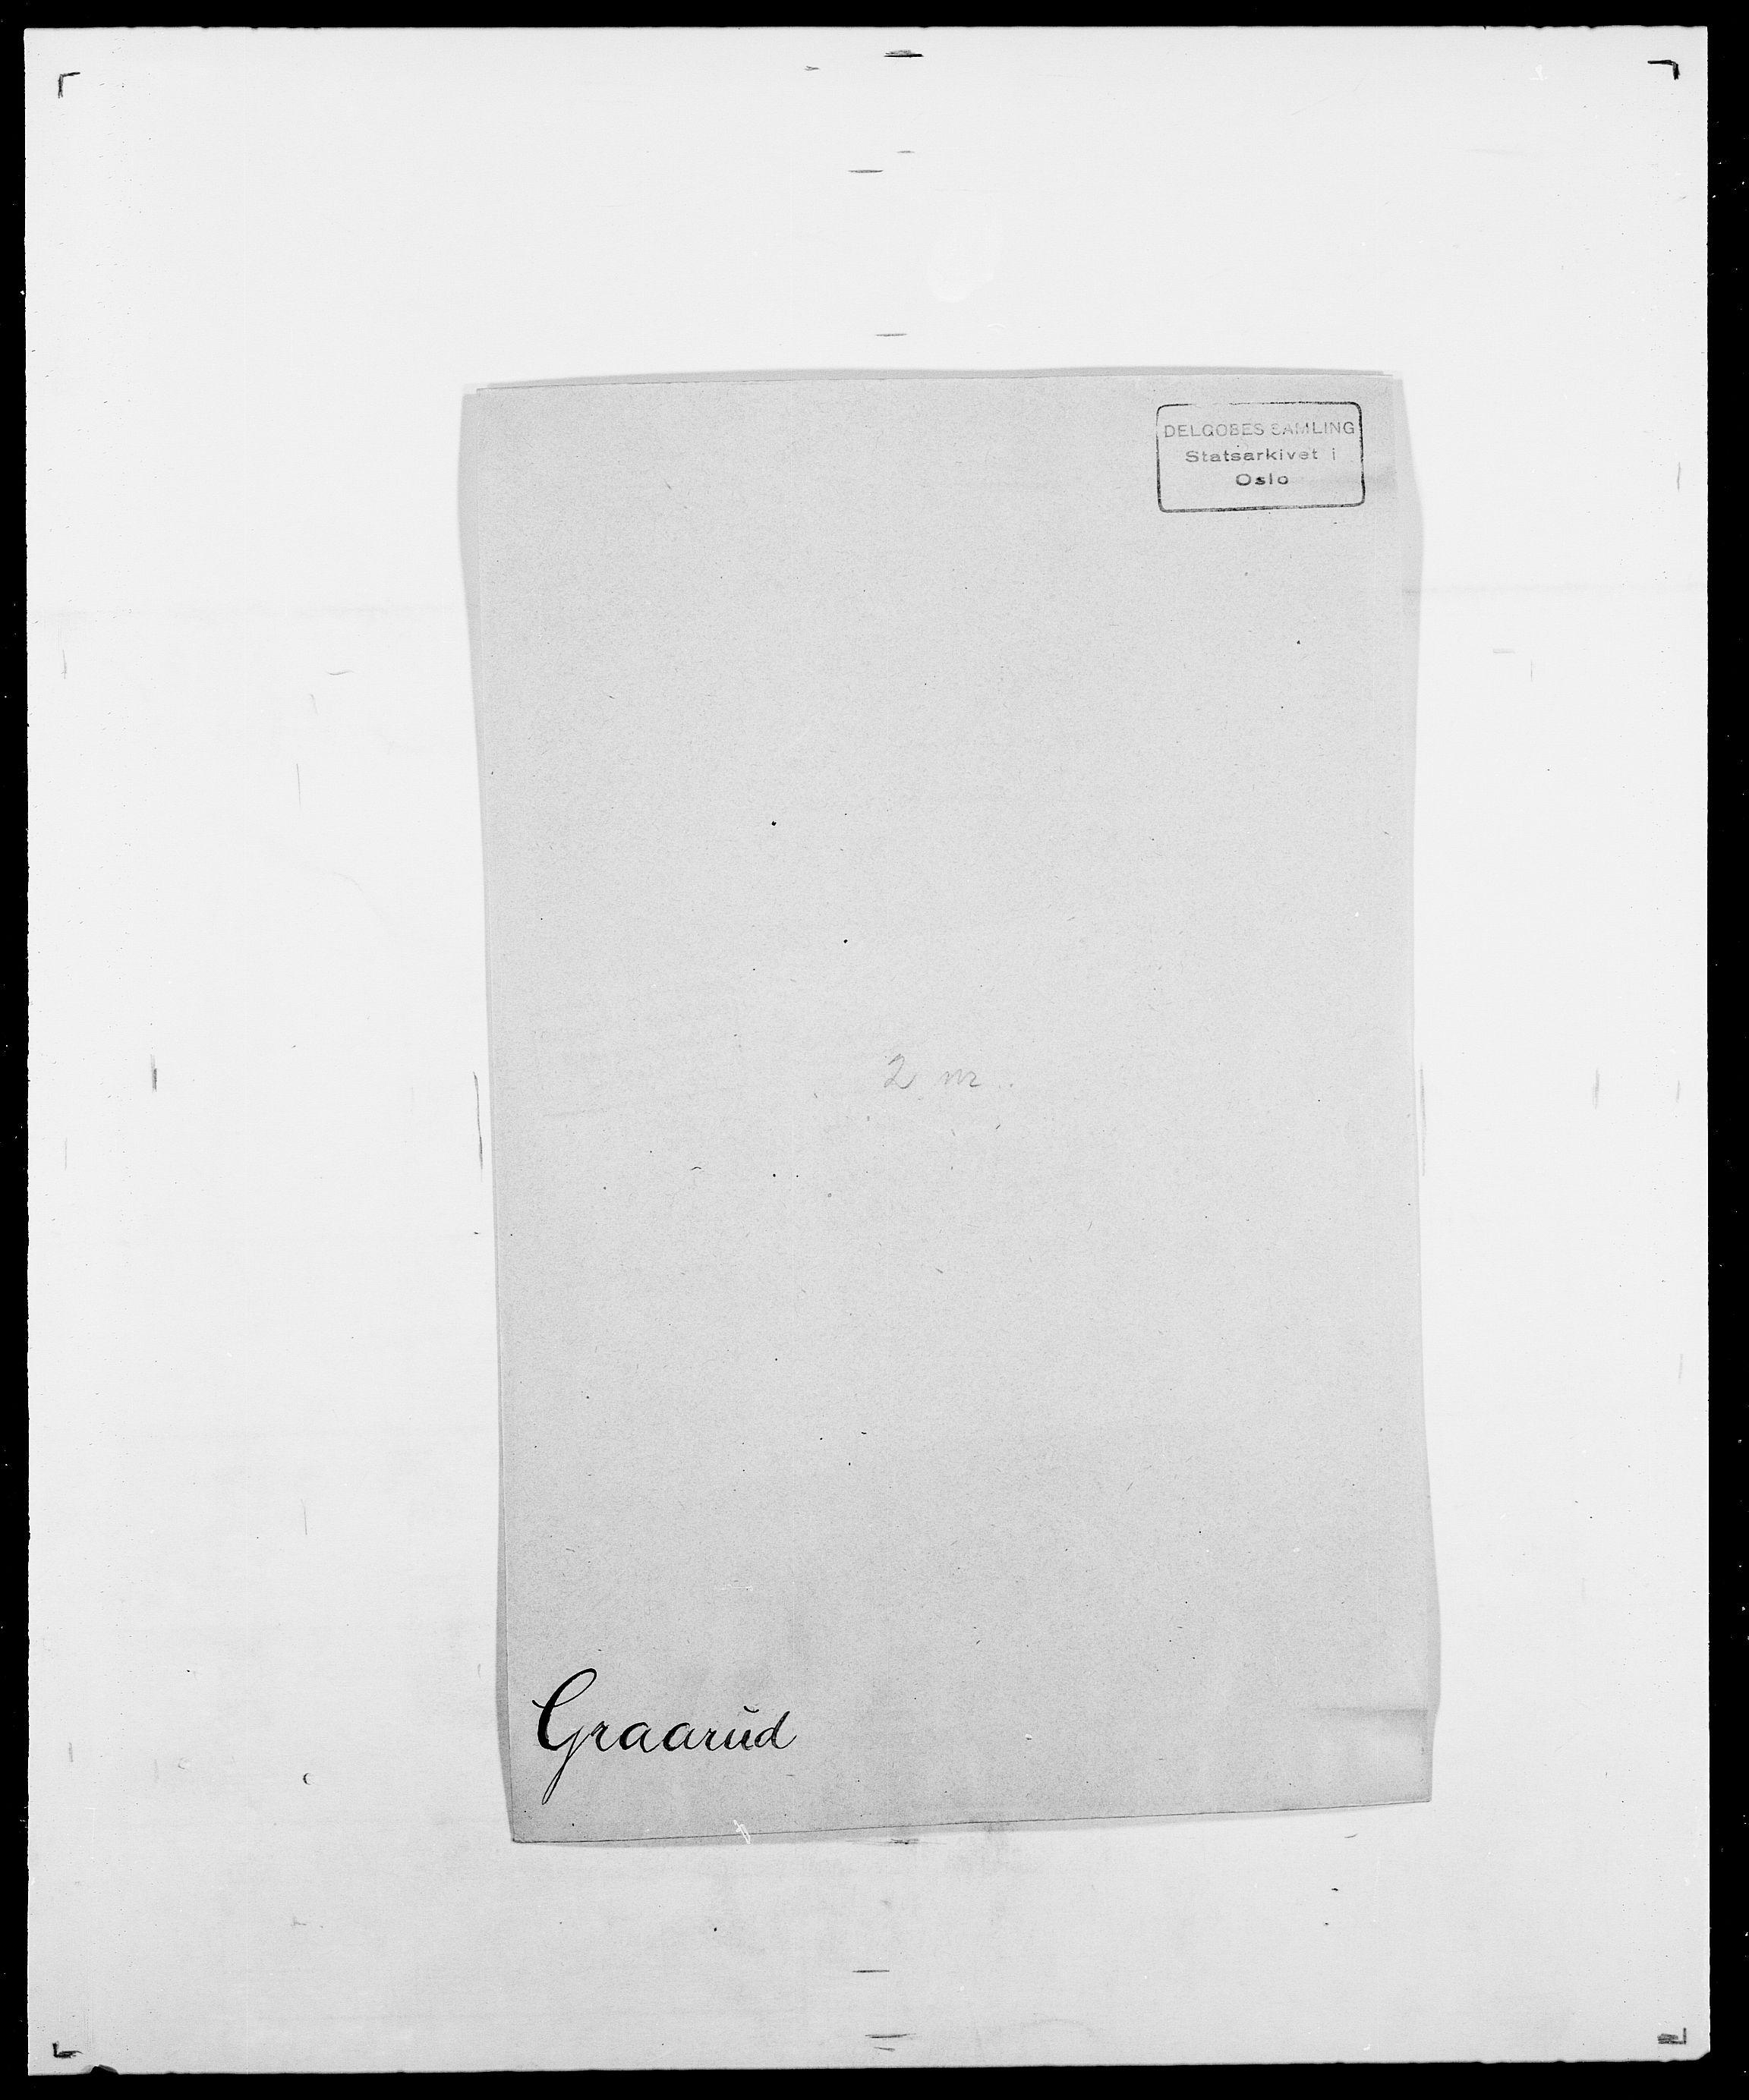 SAO, Delgobe, Charles Antoine - samling, D/Da/L0014: Giebdhausen - Grip, s. 448